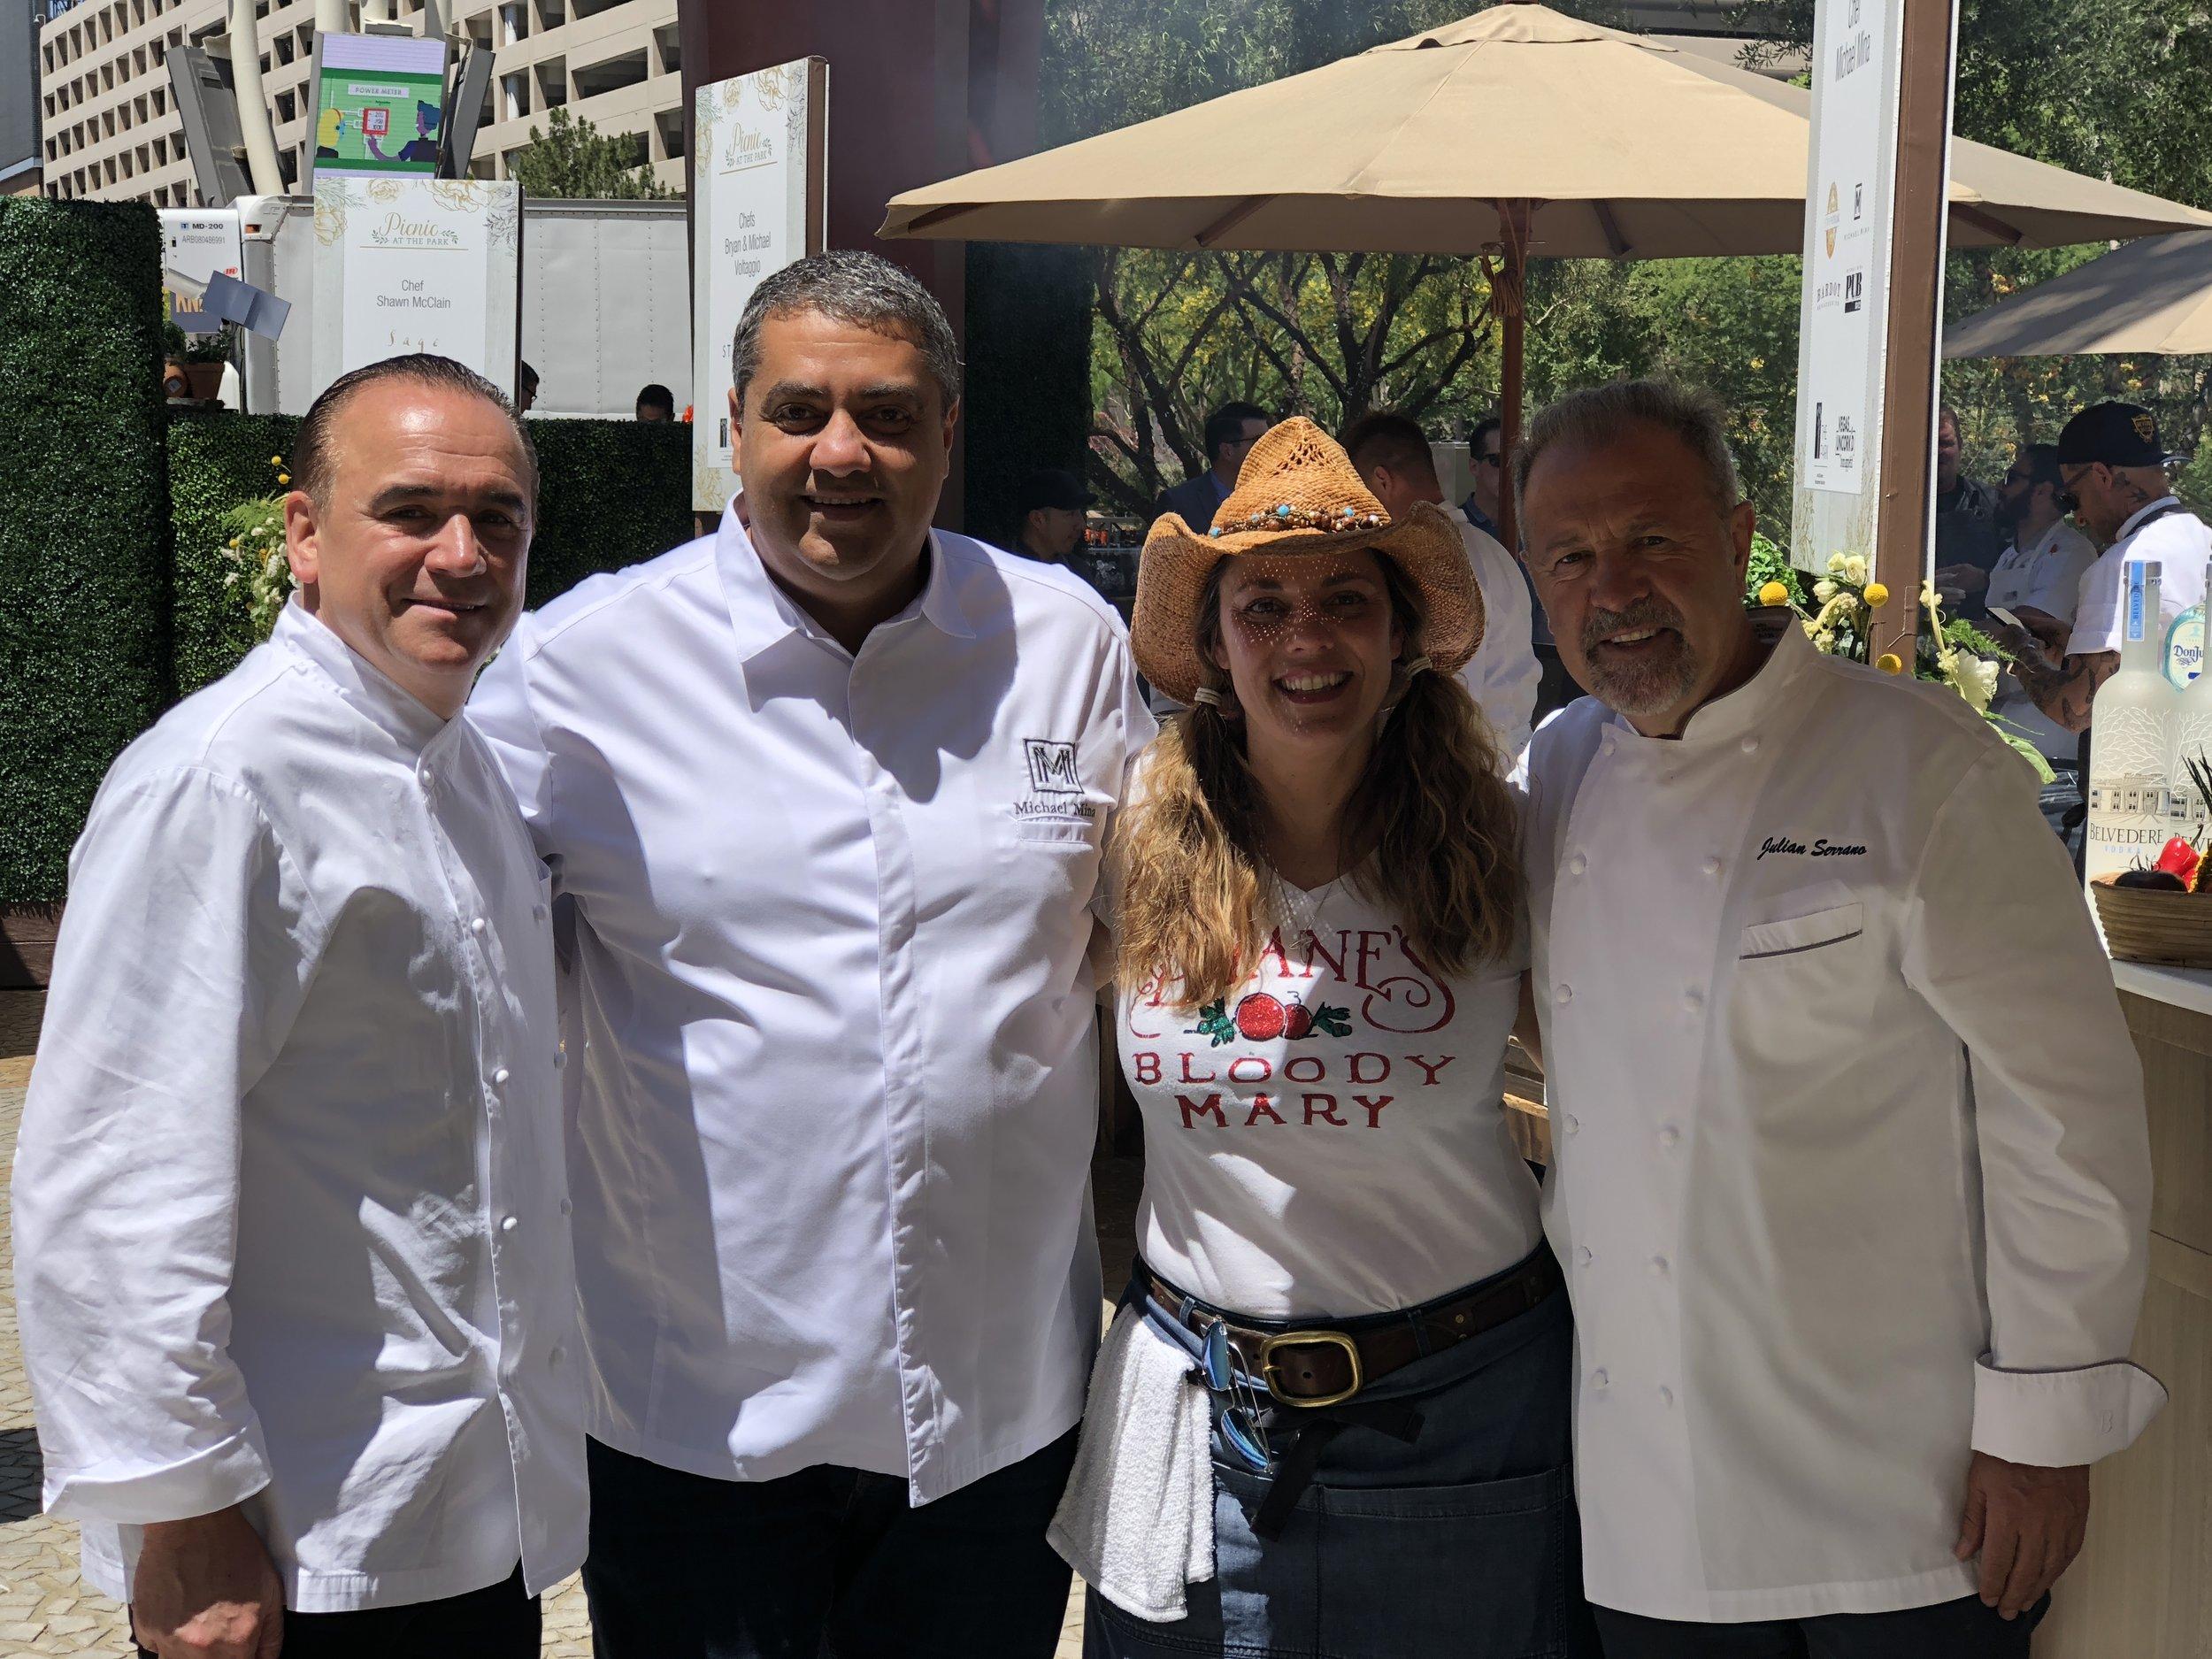 Jean-Georges Vongerichten, Michael Mina, Diane Mina, Julian Serrano - Picnic at The Park - 2018